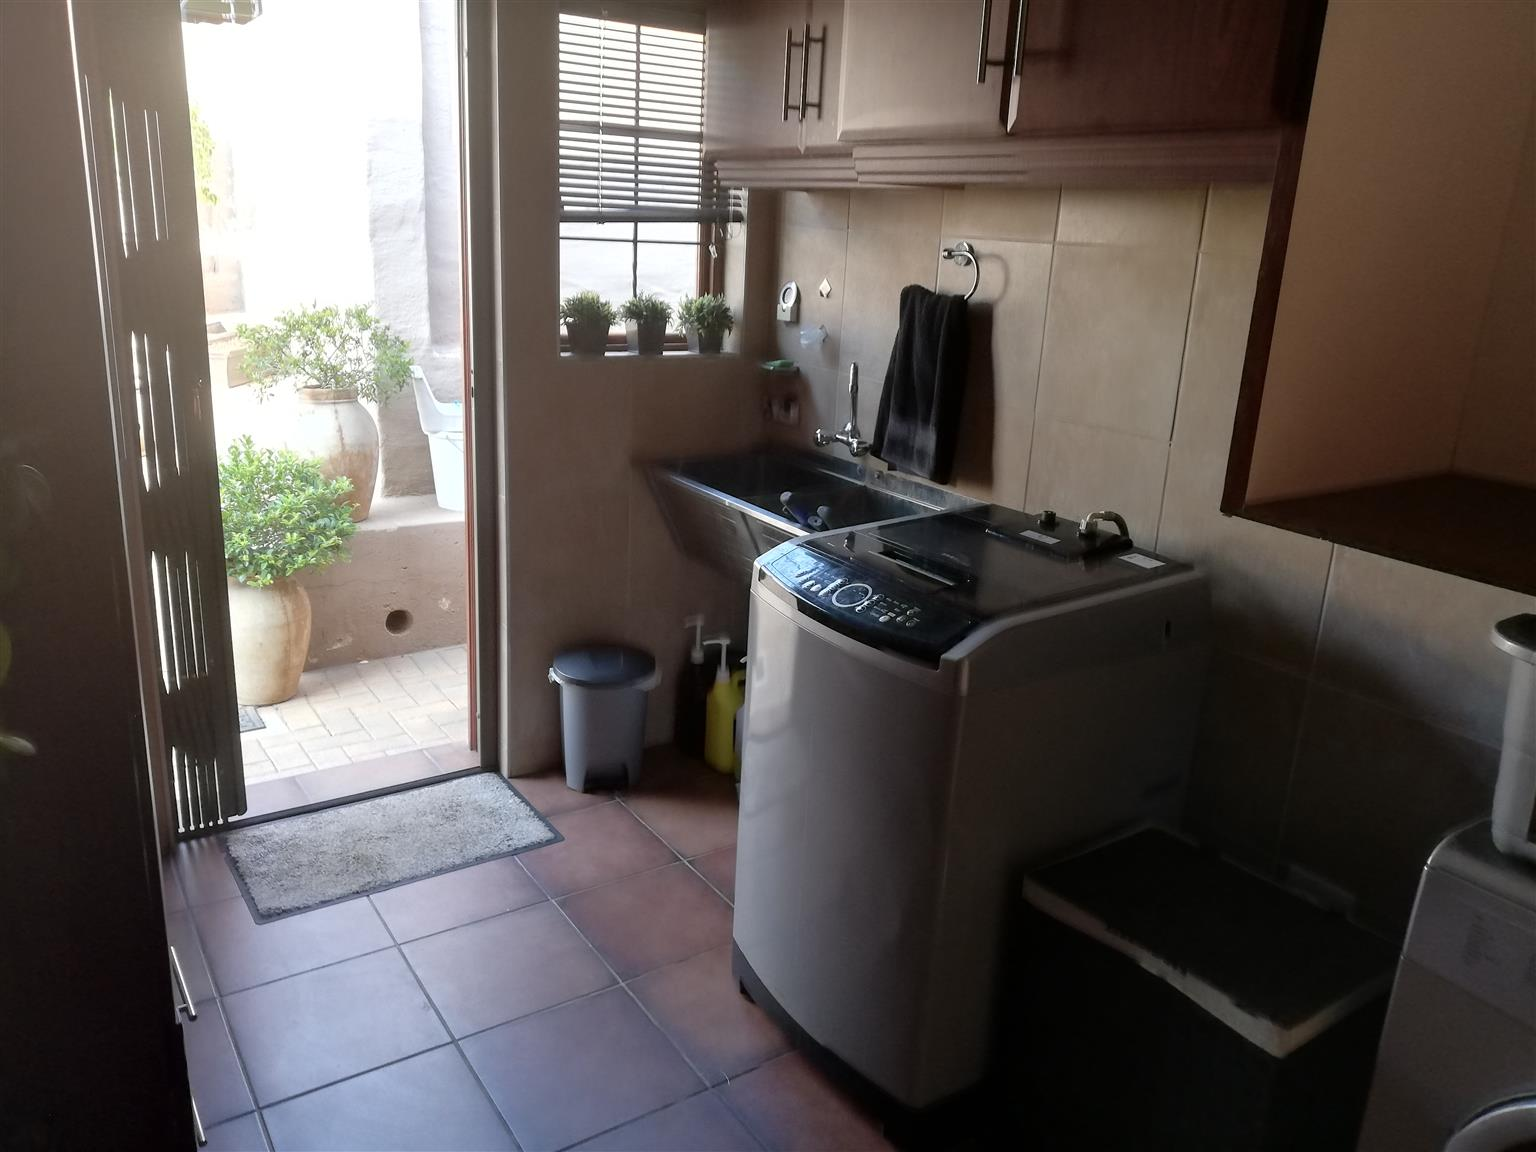 HOUSE IN ERASMUSRAND (PRETORIA) FOR SALE